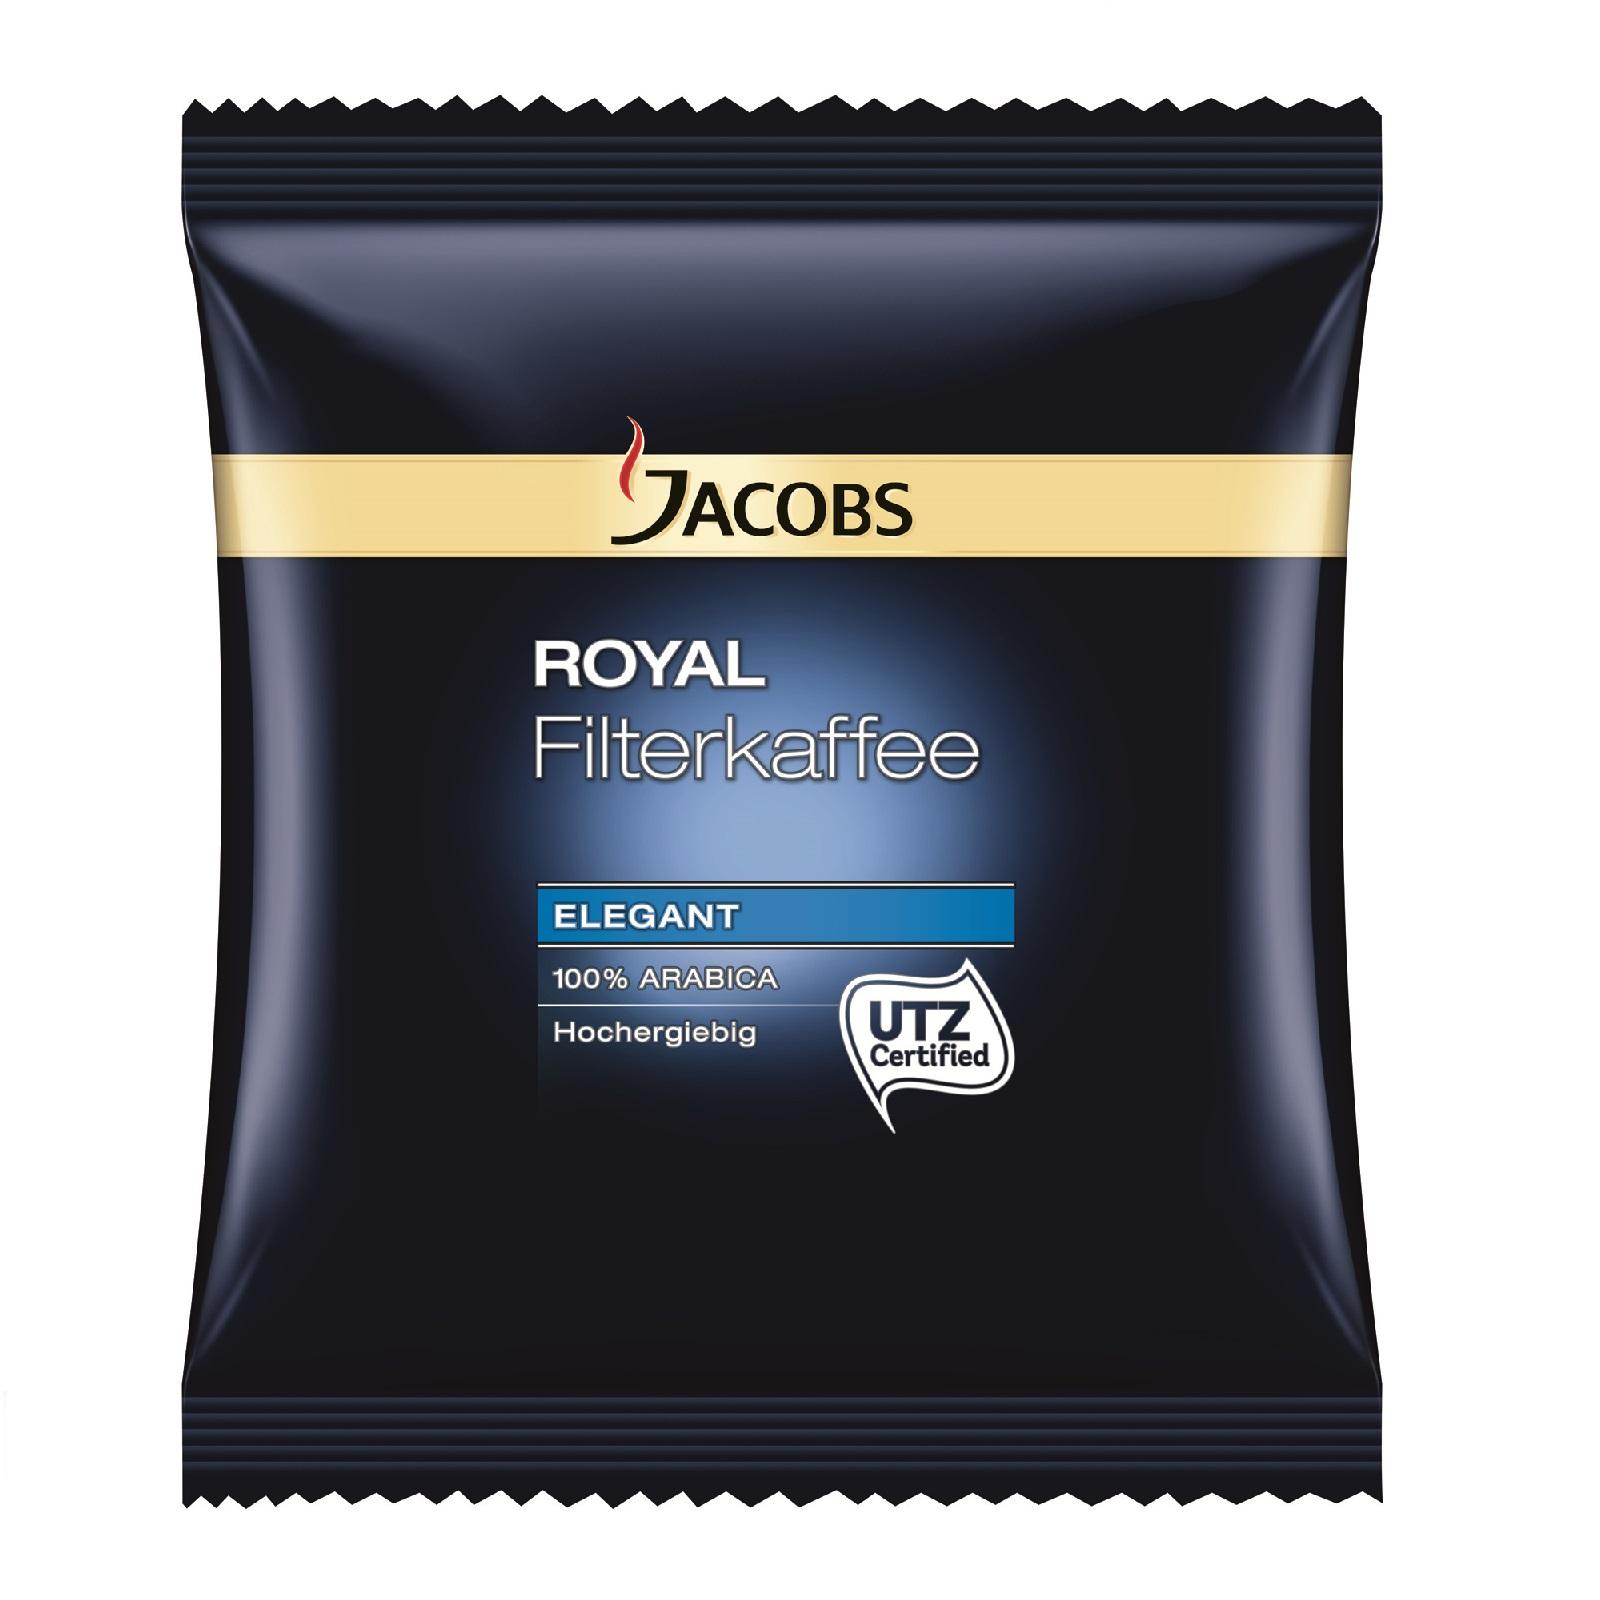 Jacobs Royal Elegant 100% Arabica 72 x 70g Kaffee gemahlen